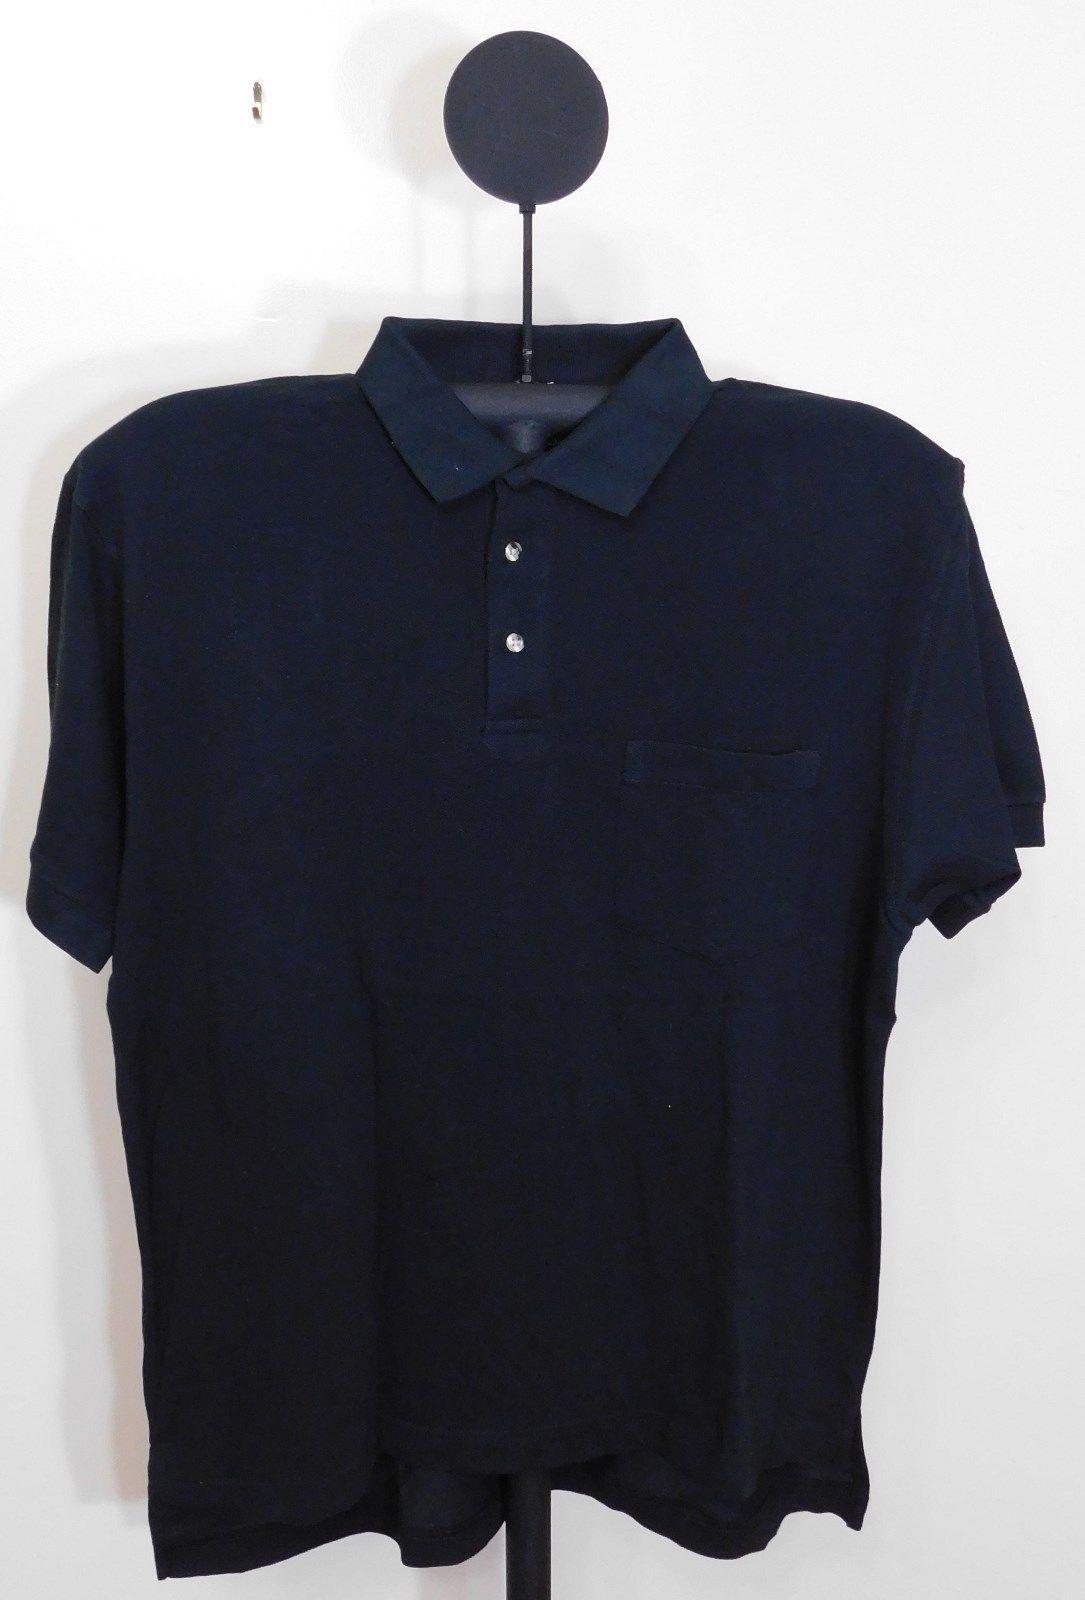 New Stone Temple Pilots Smoke Logo Black Long Sleeve T-Shirt Size S-3XL